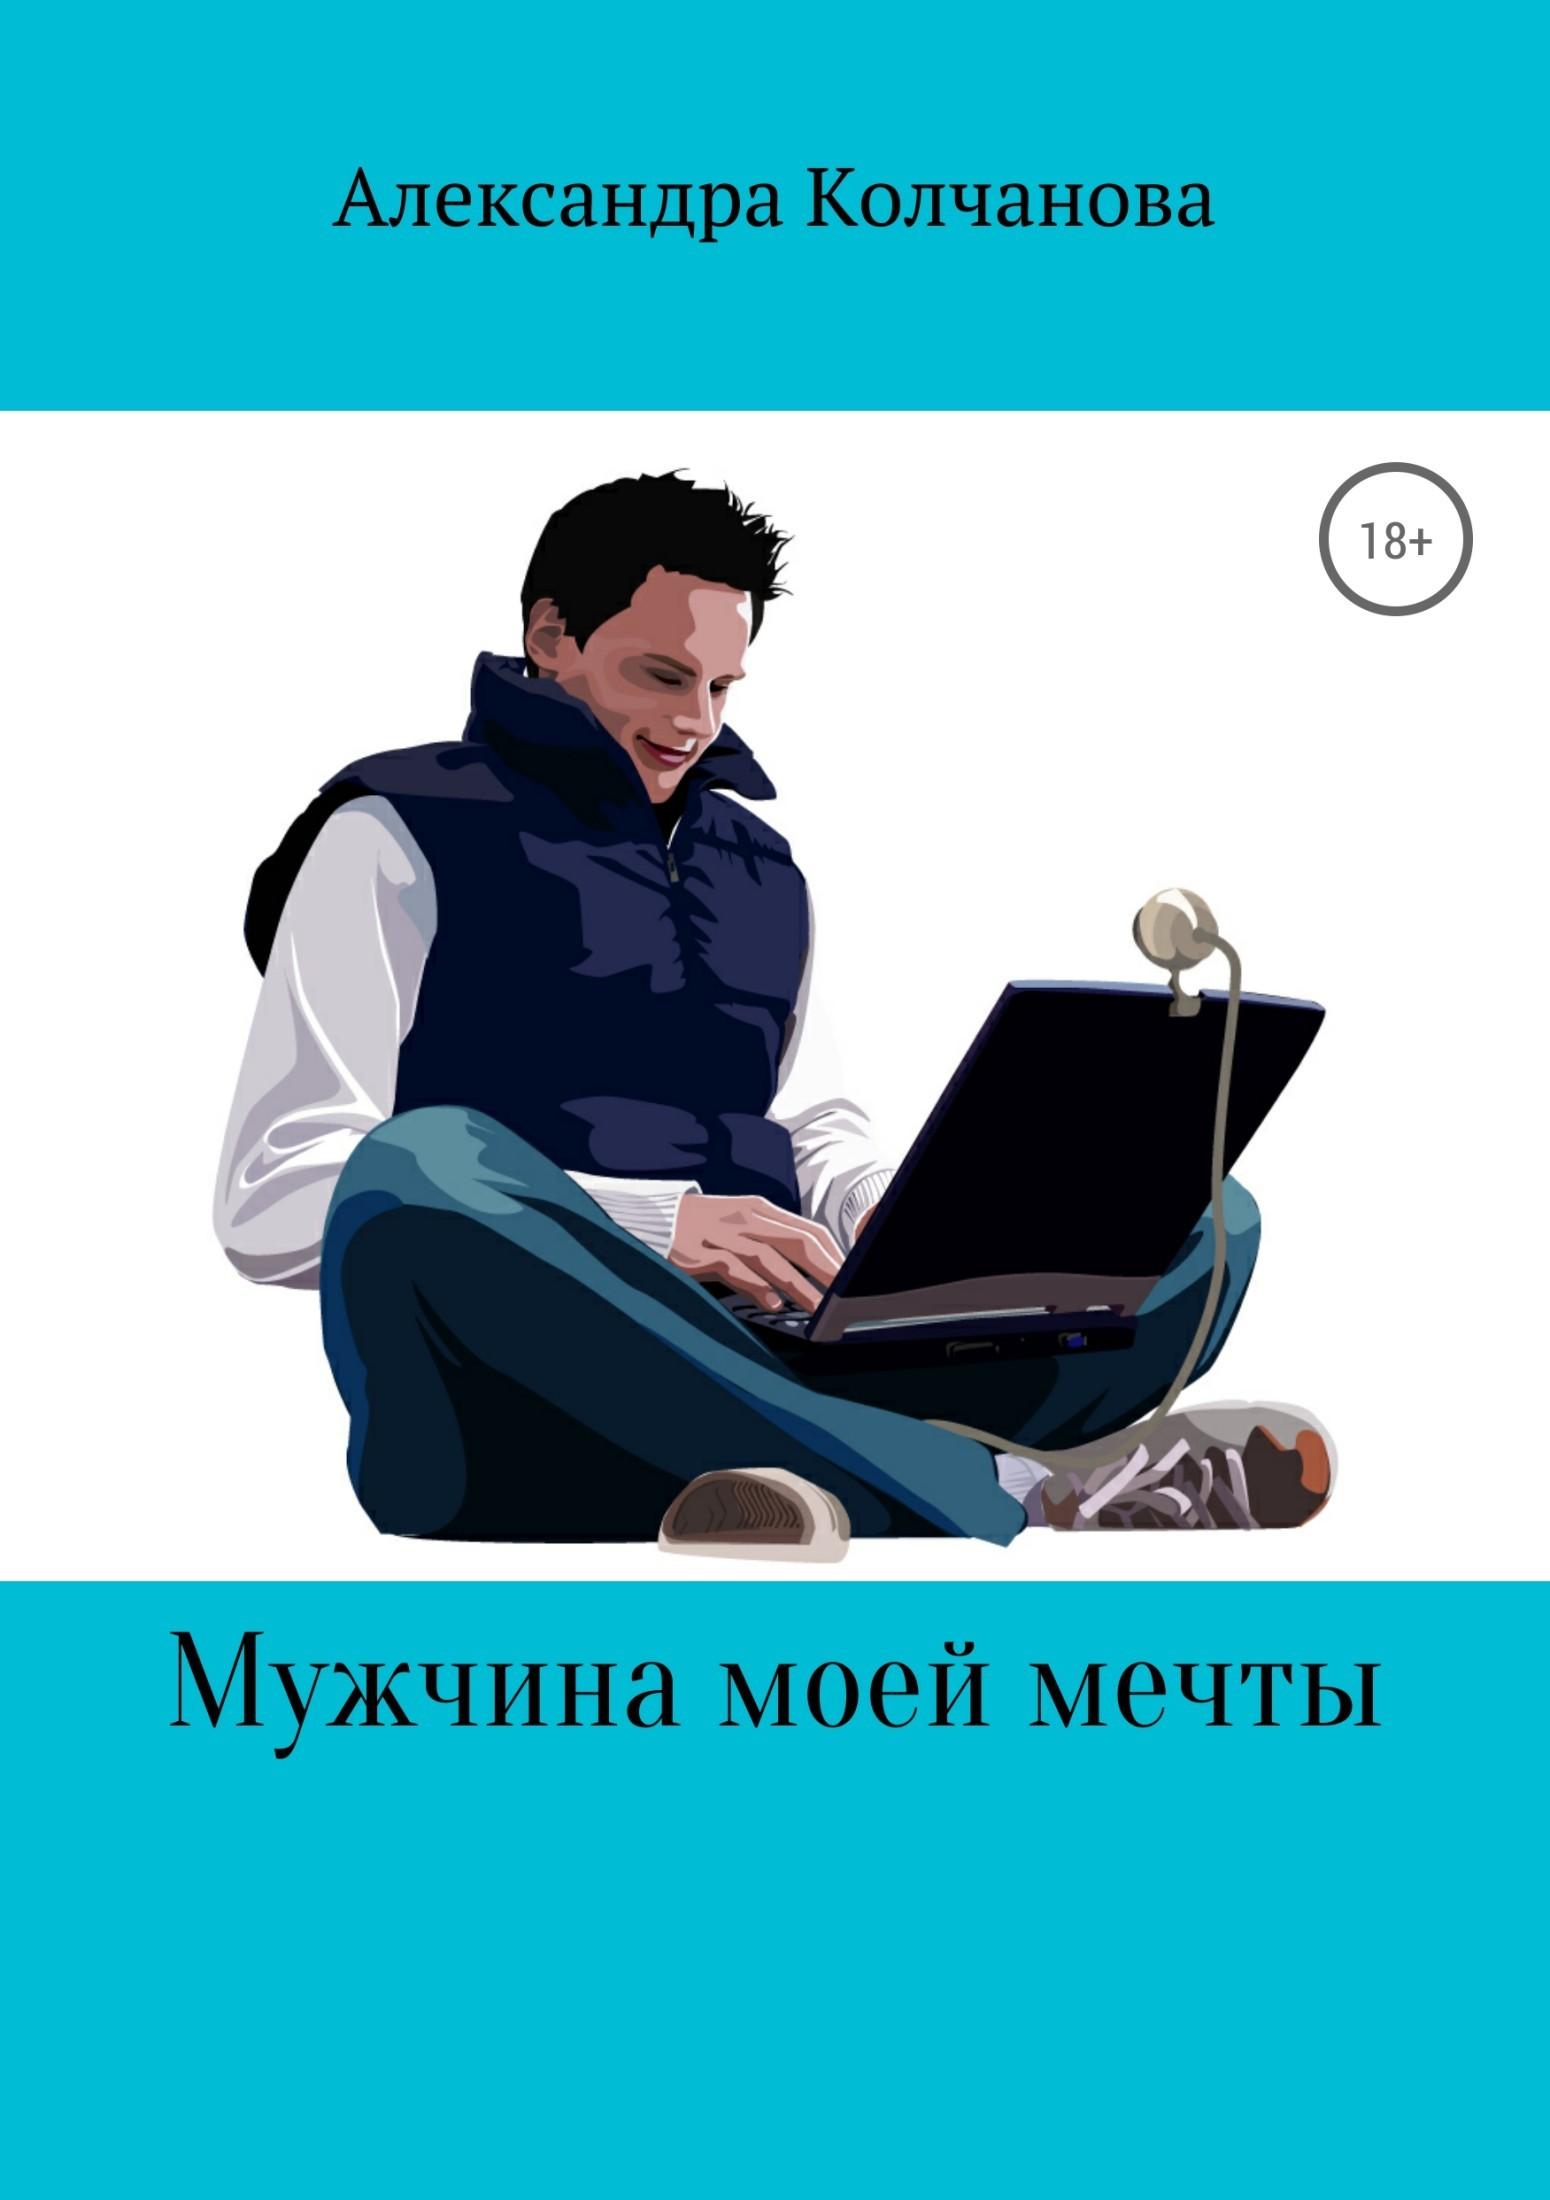 Александра Колчанова Мужчина моей мечты